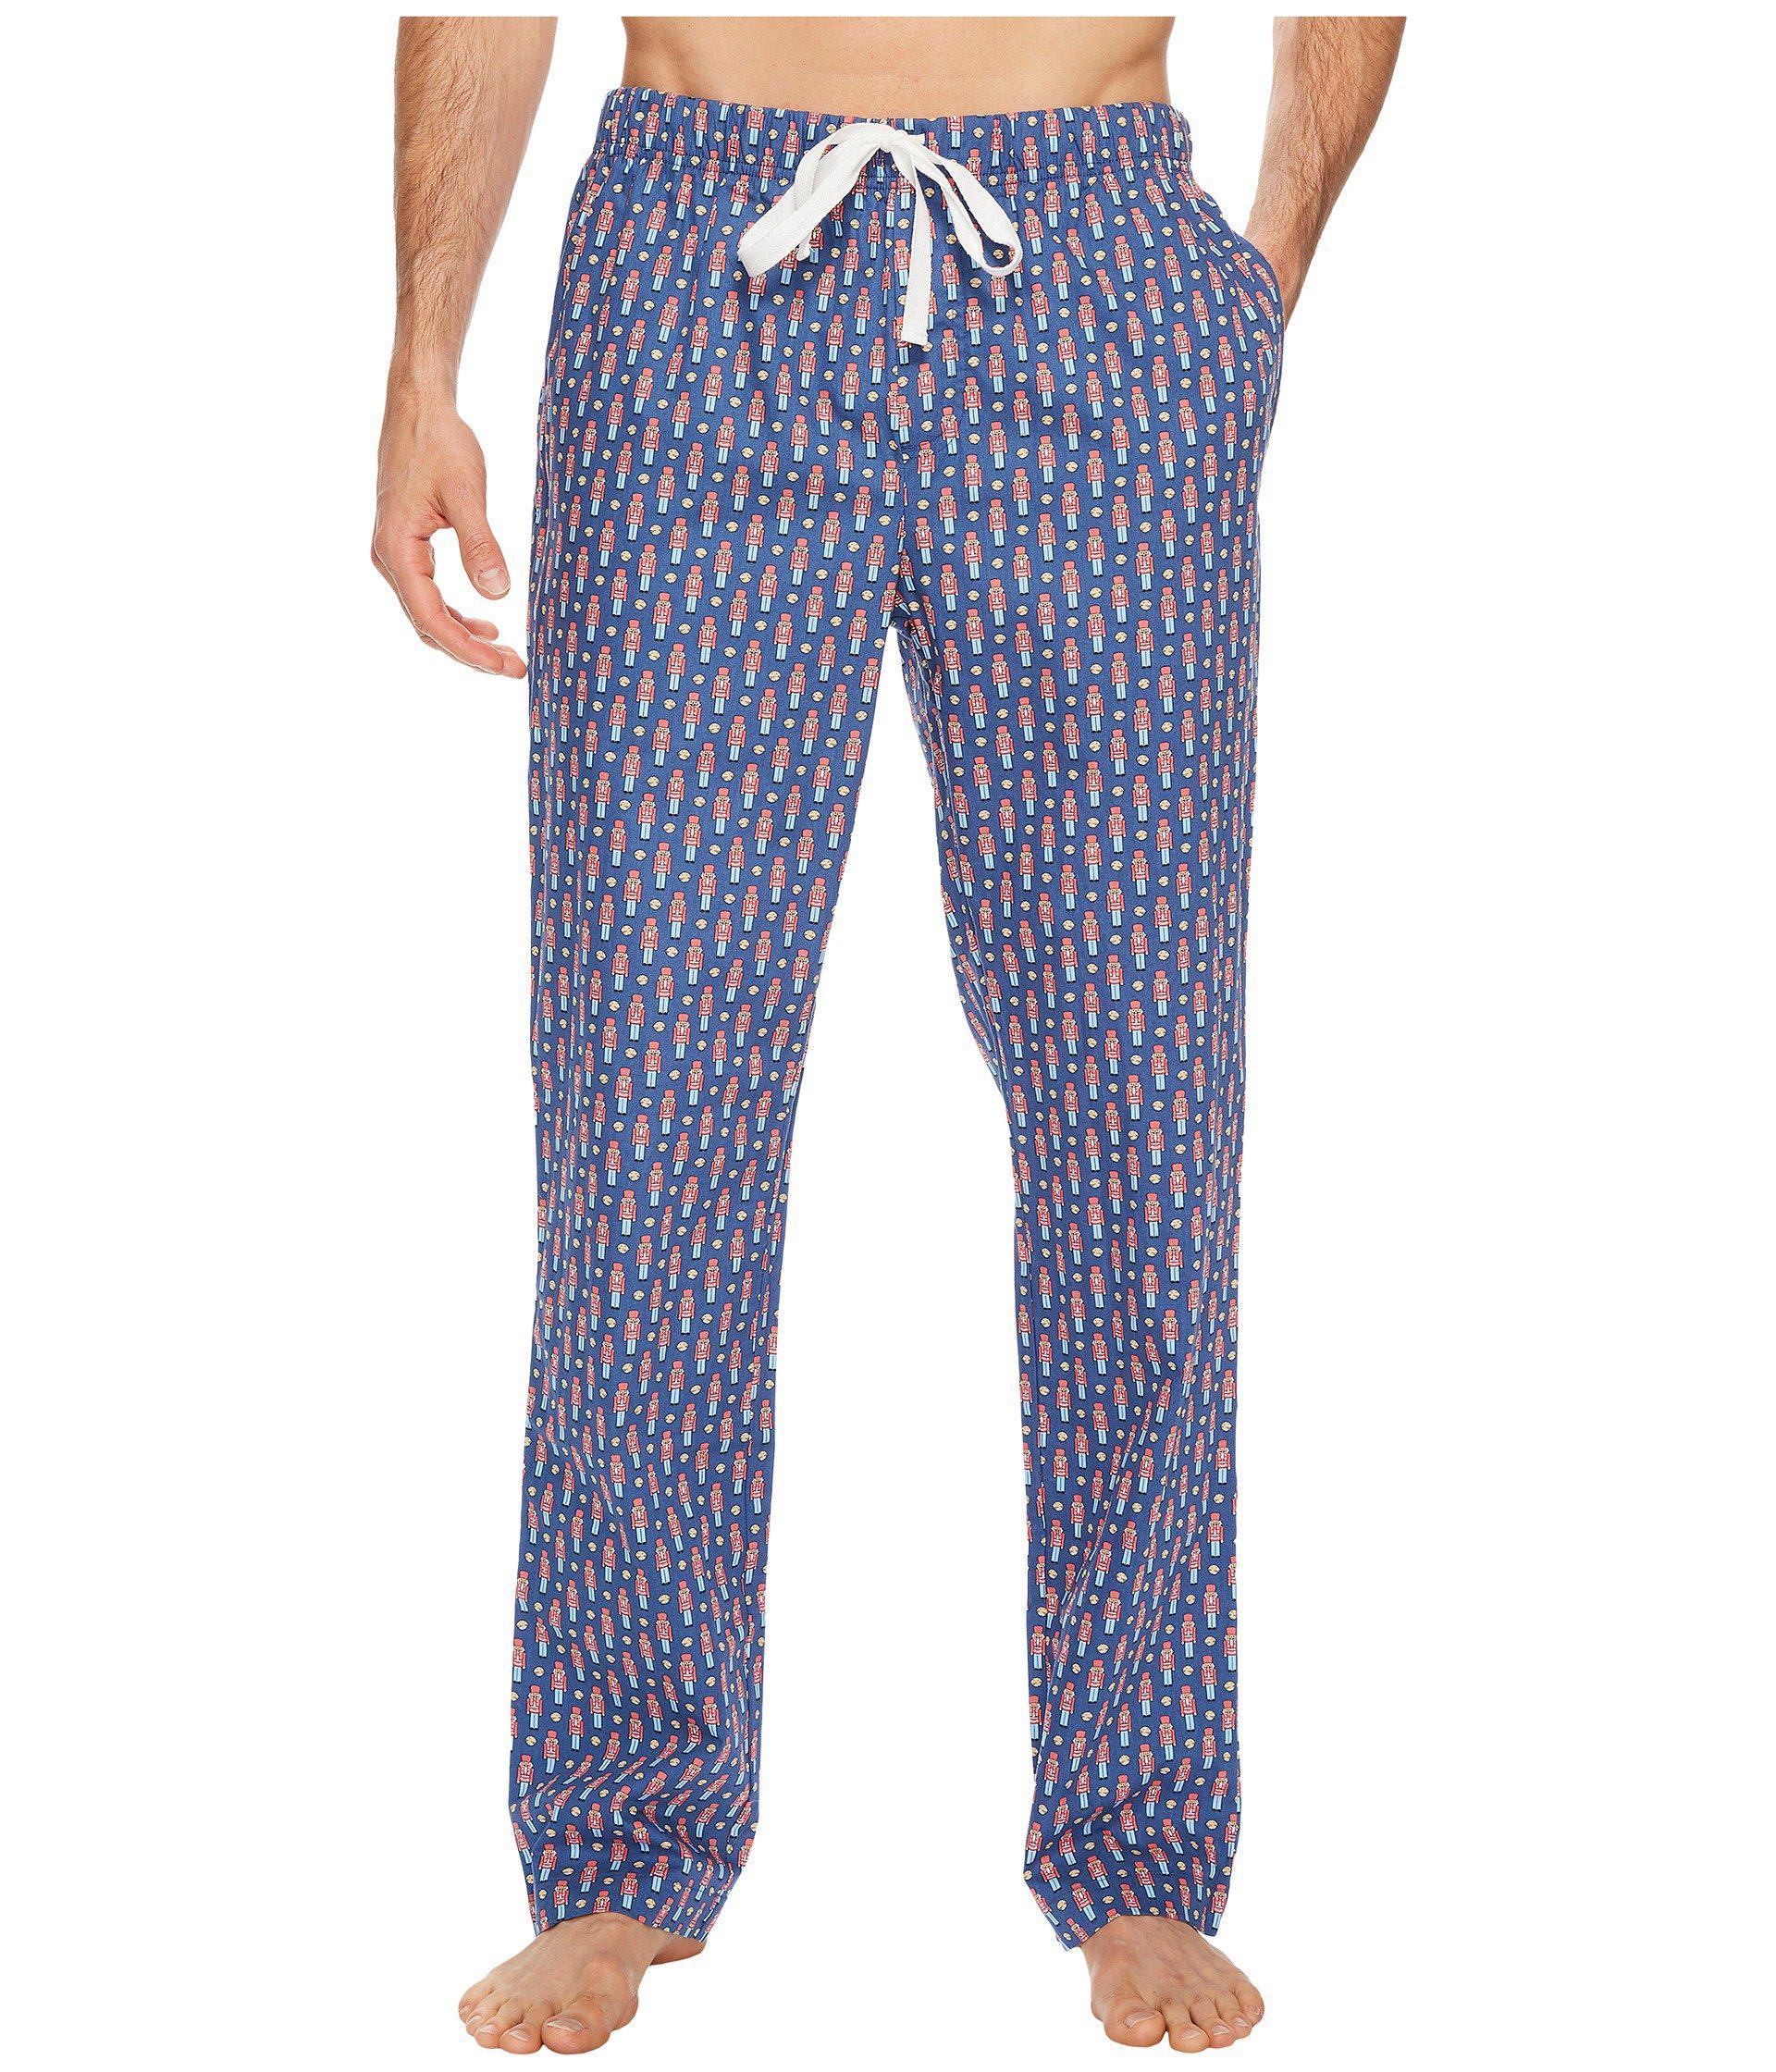 Vineyard Vines Men/'s Moonshine Blue Nutcracker Graphic Lounge Pants